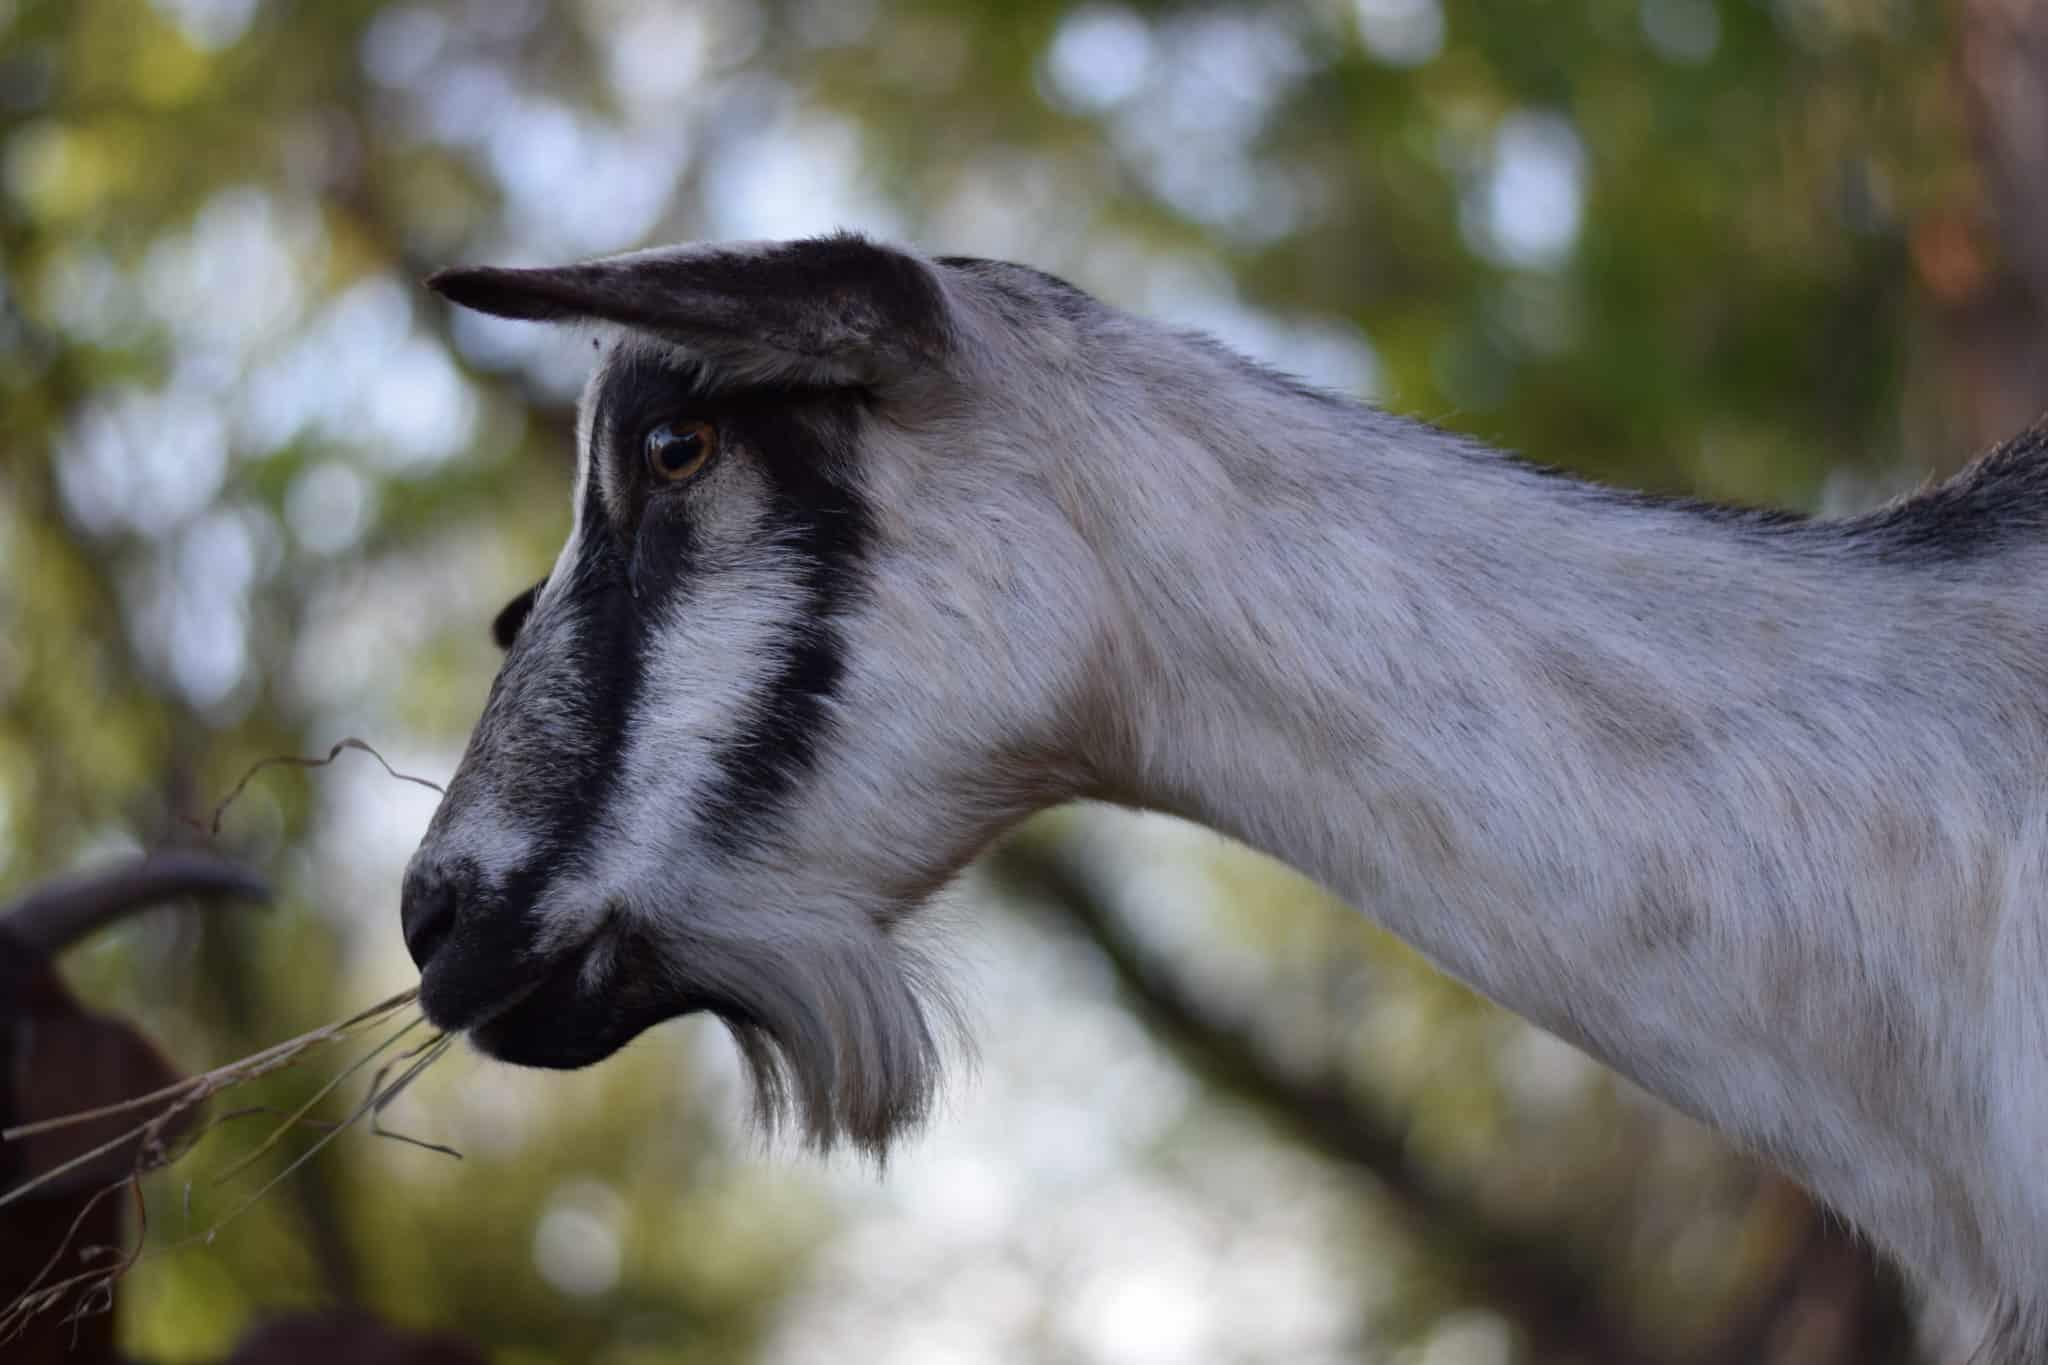 alpine goat outside eating hay